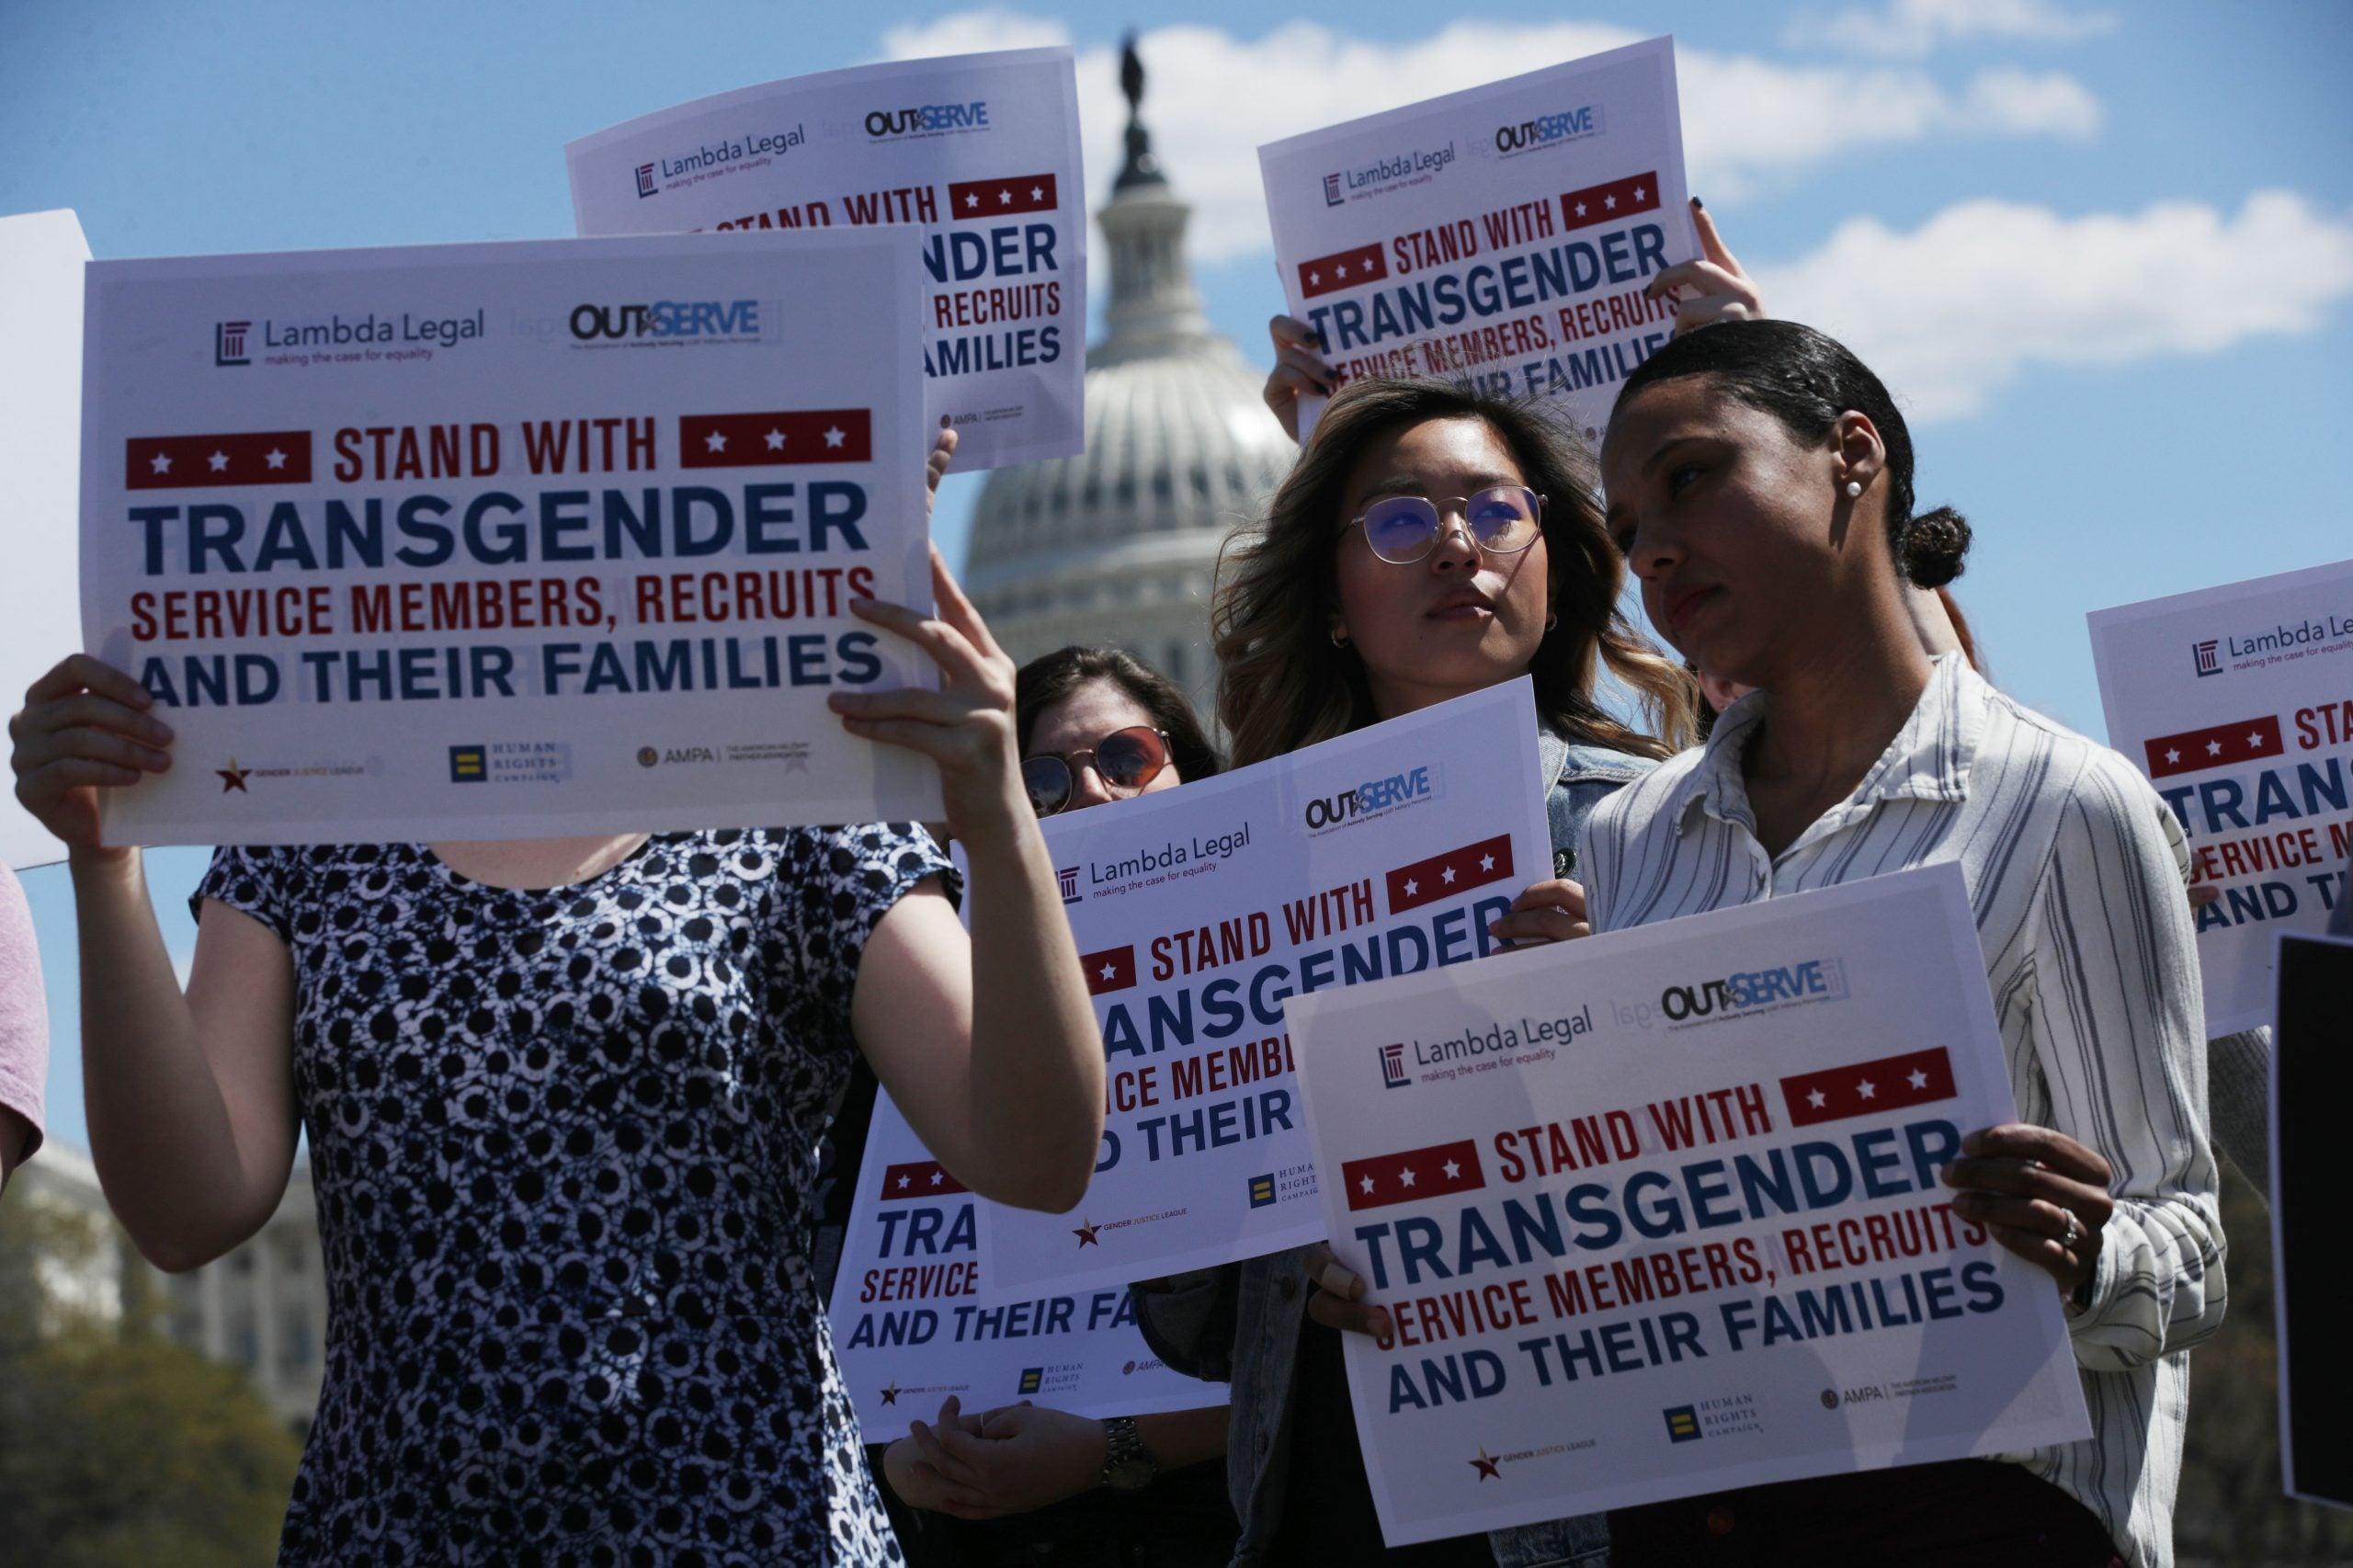 President Biden Lifts Ban on Transgender Military Members